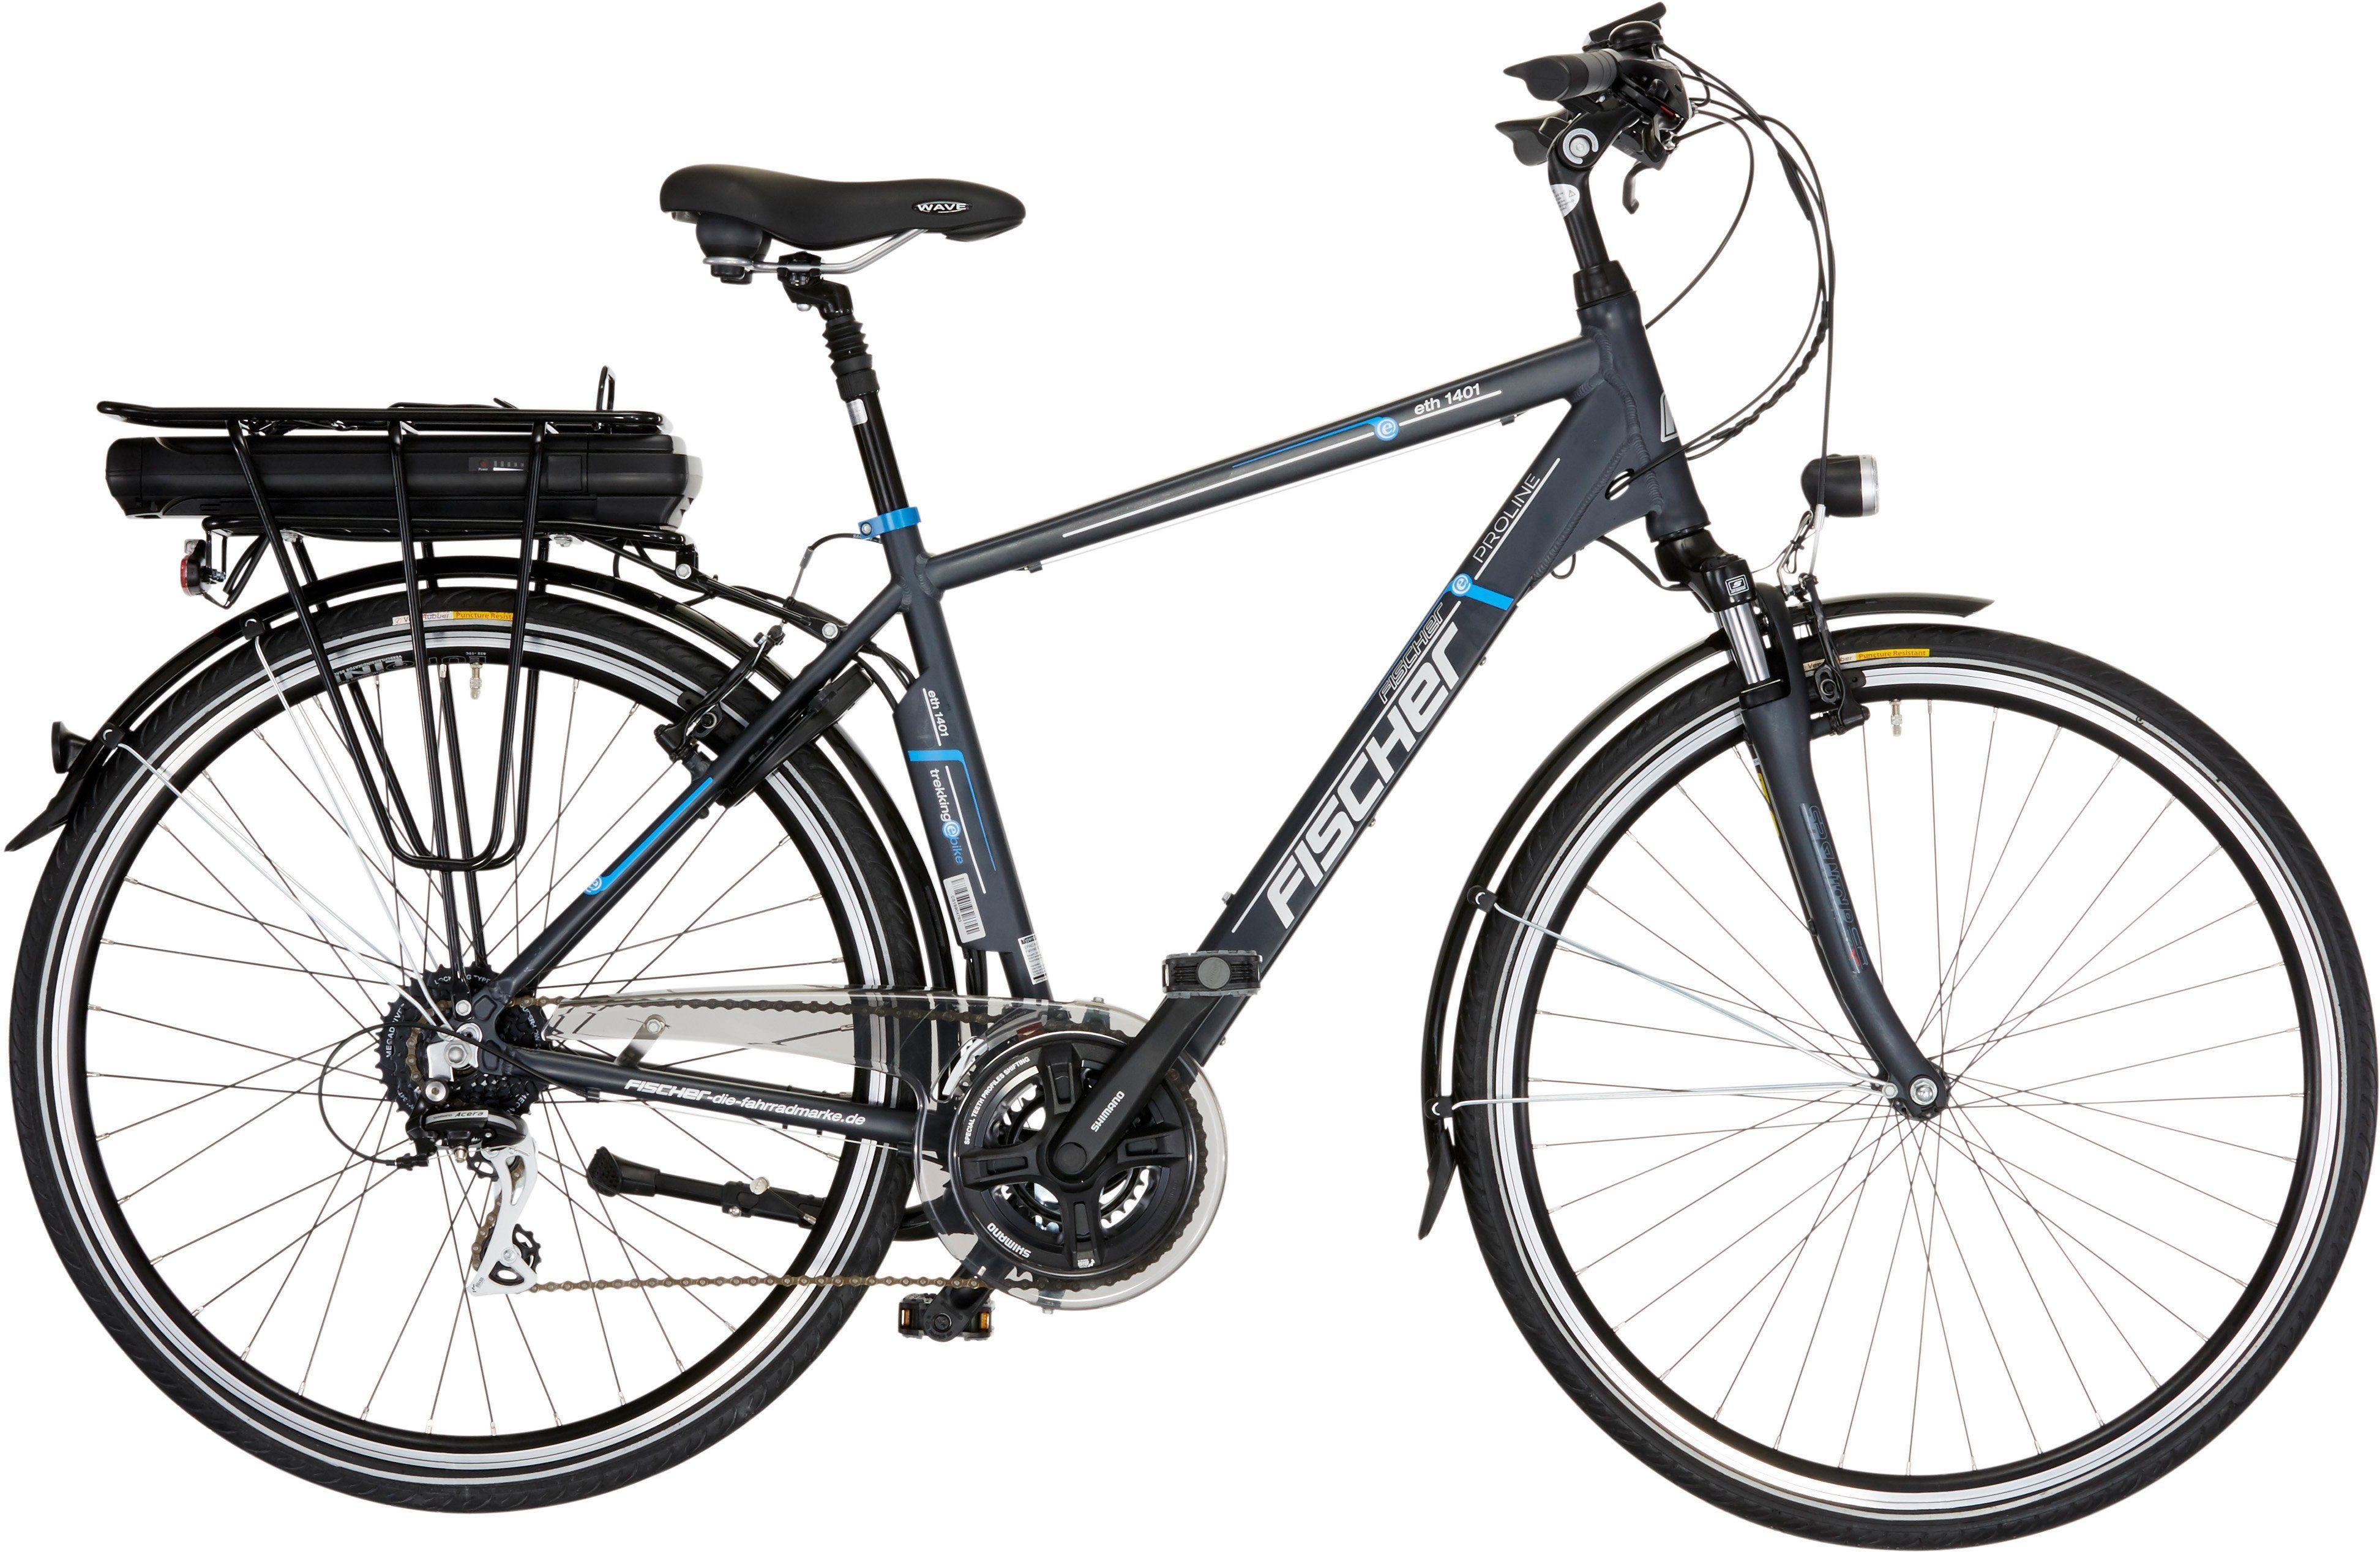 FISCHER Herren Trekking E-Bike, 36V/250W Hinterradmotor, 28 Zoll, 24 Gg.-Shimano Acera Kettensch.